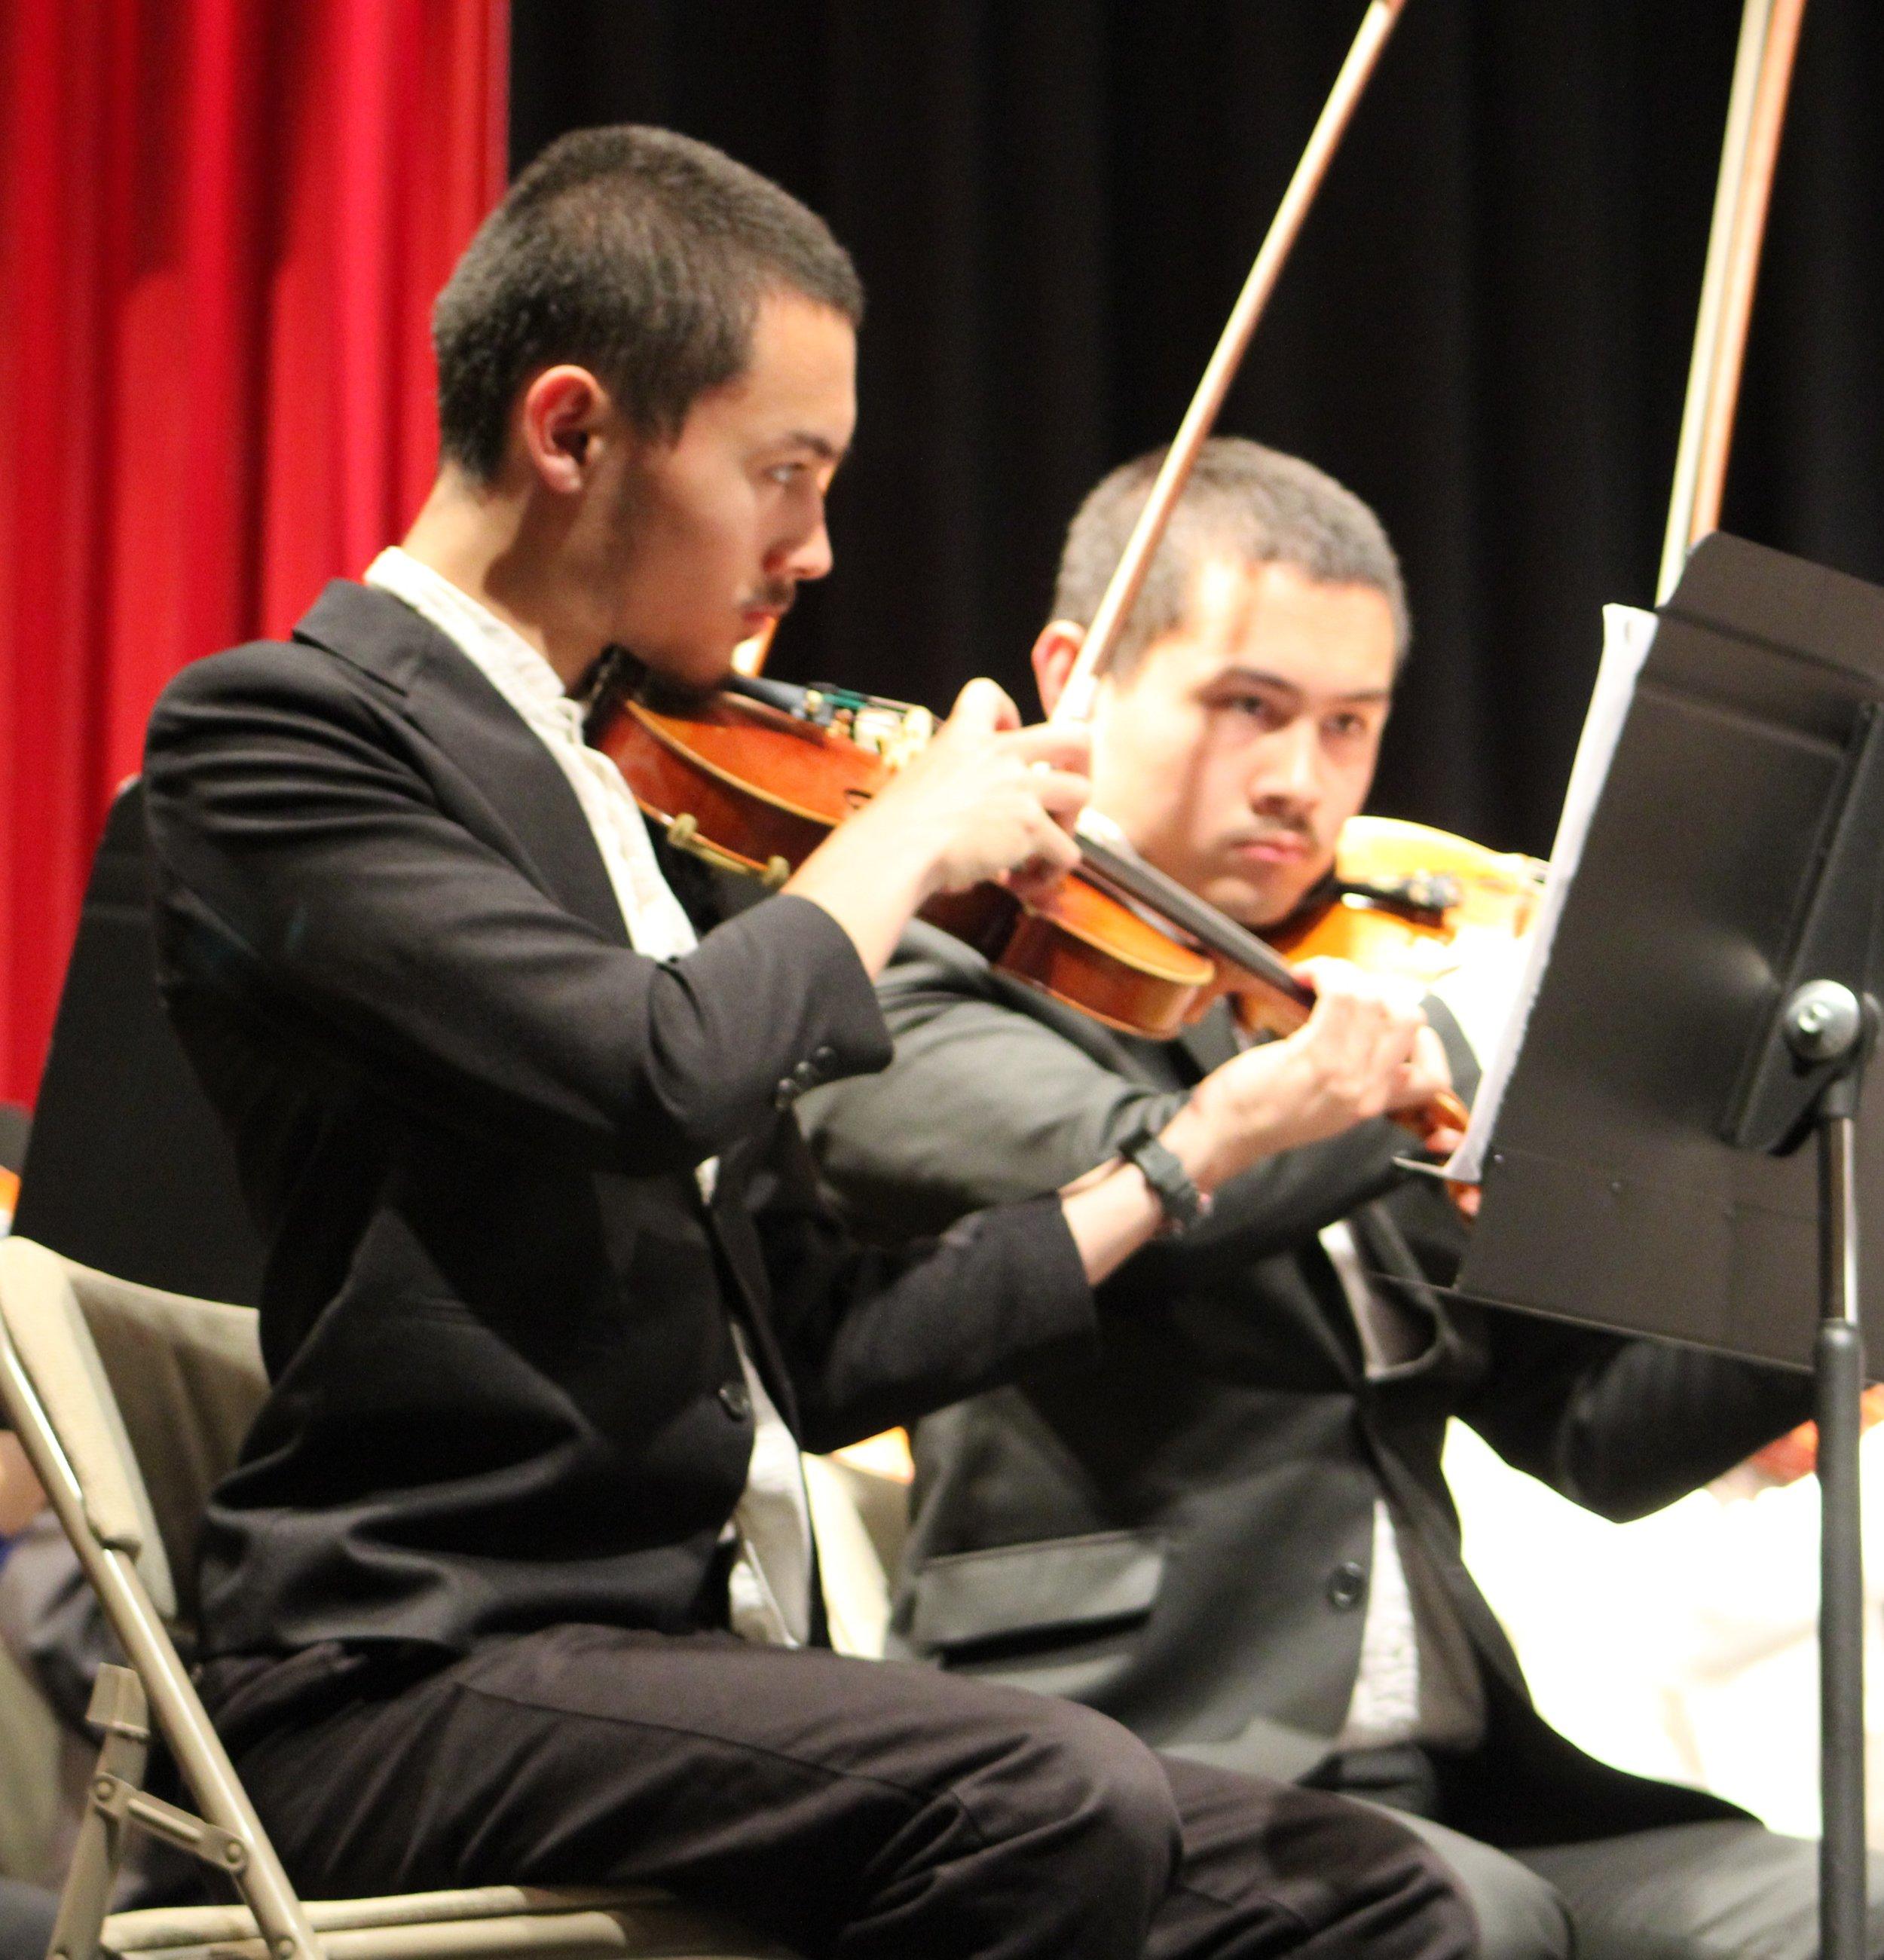 CHYS Spring Concert 7 violins JPG.jpg